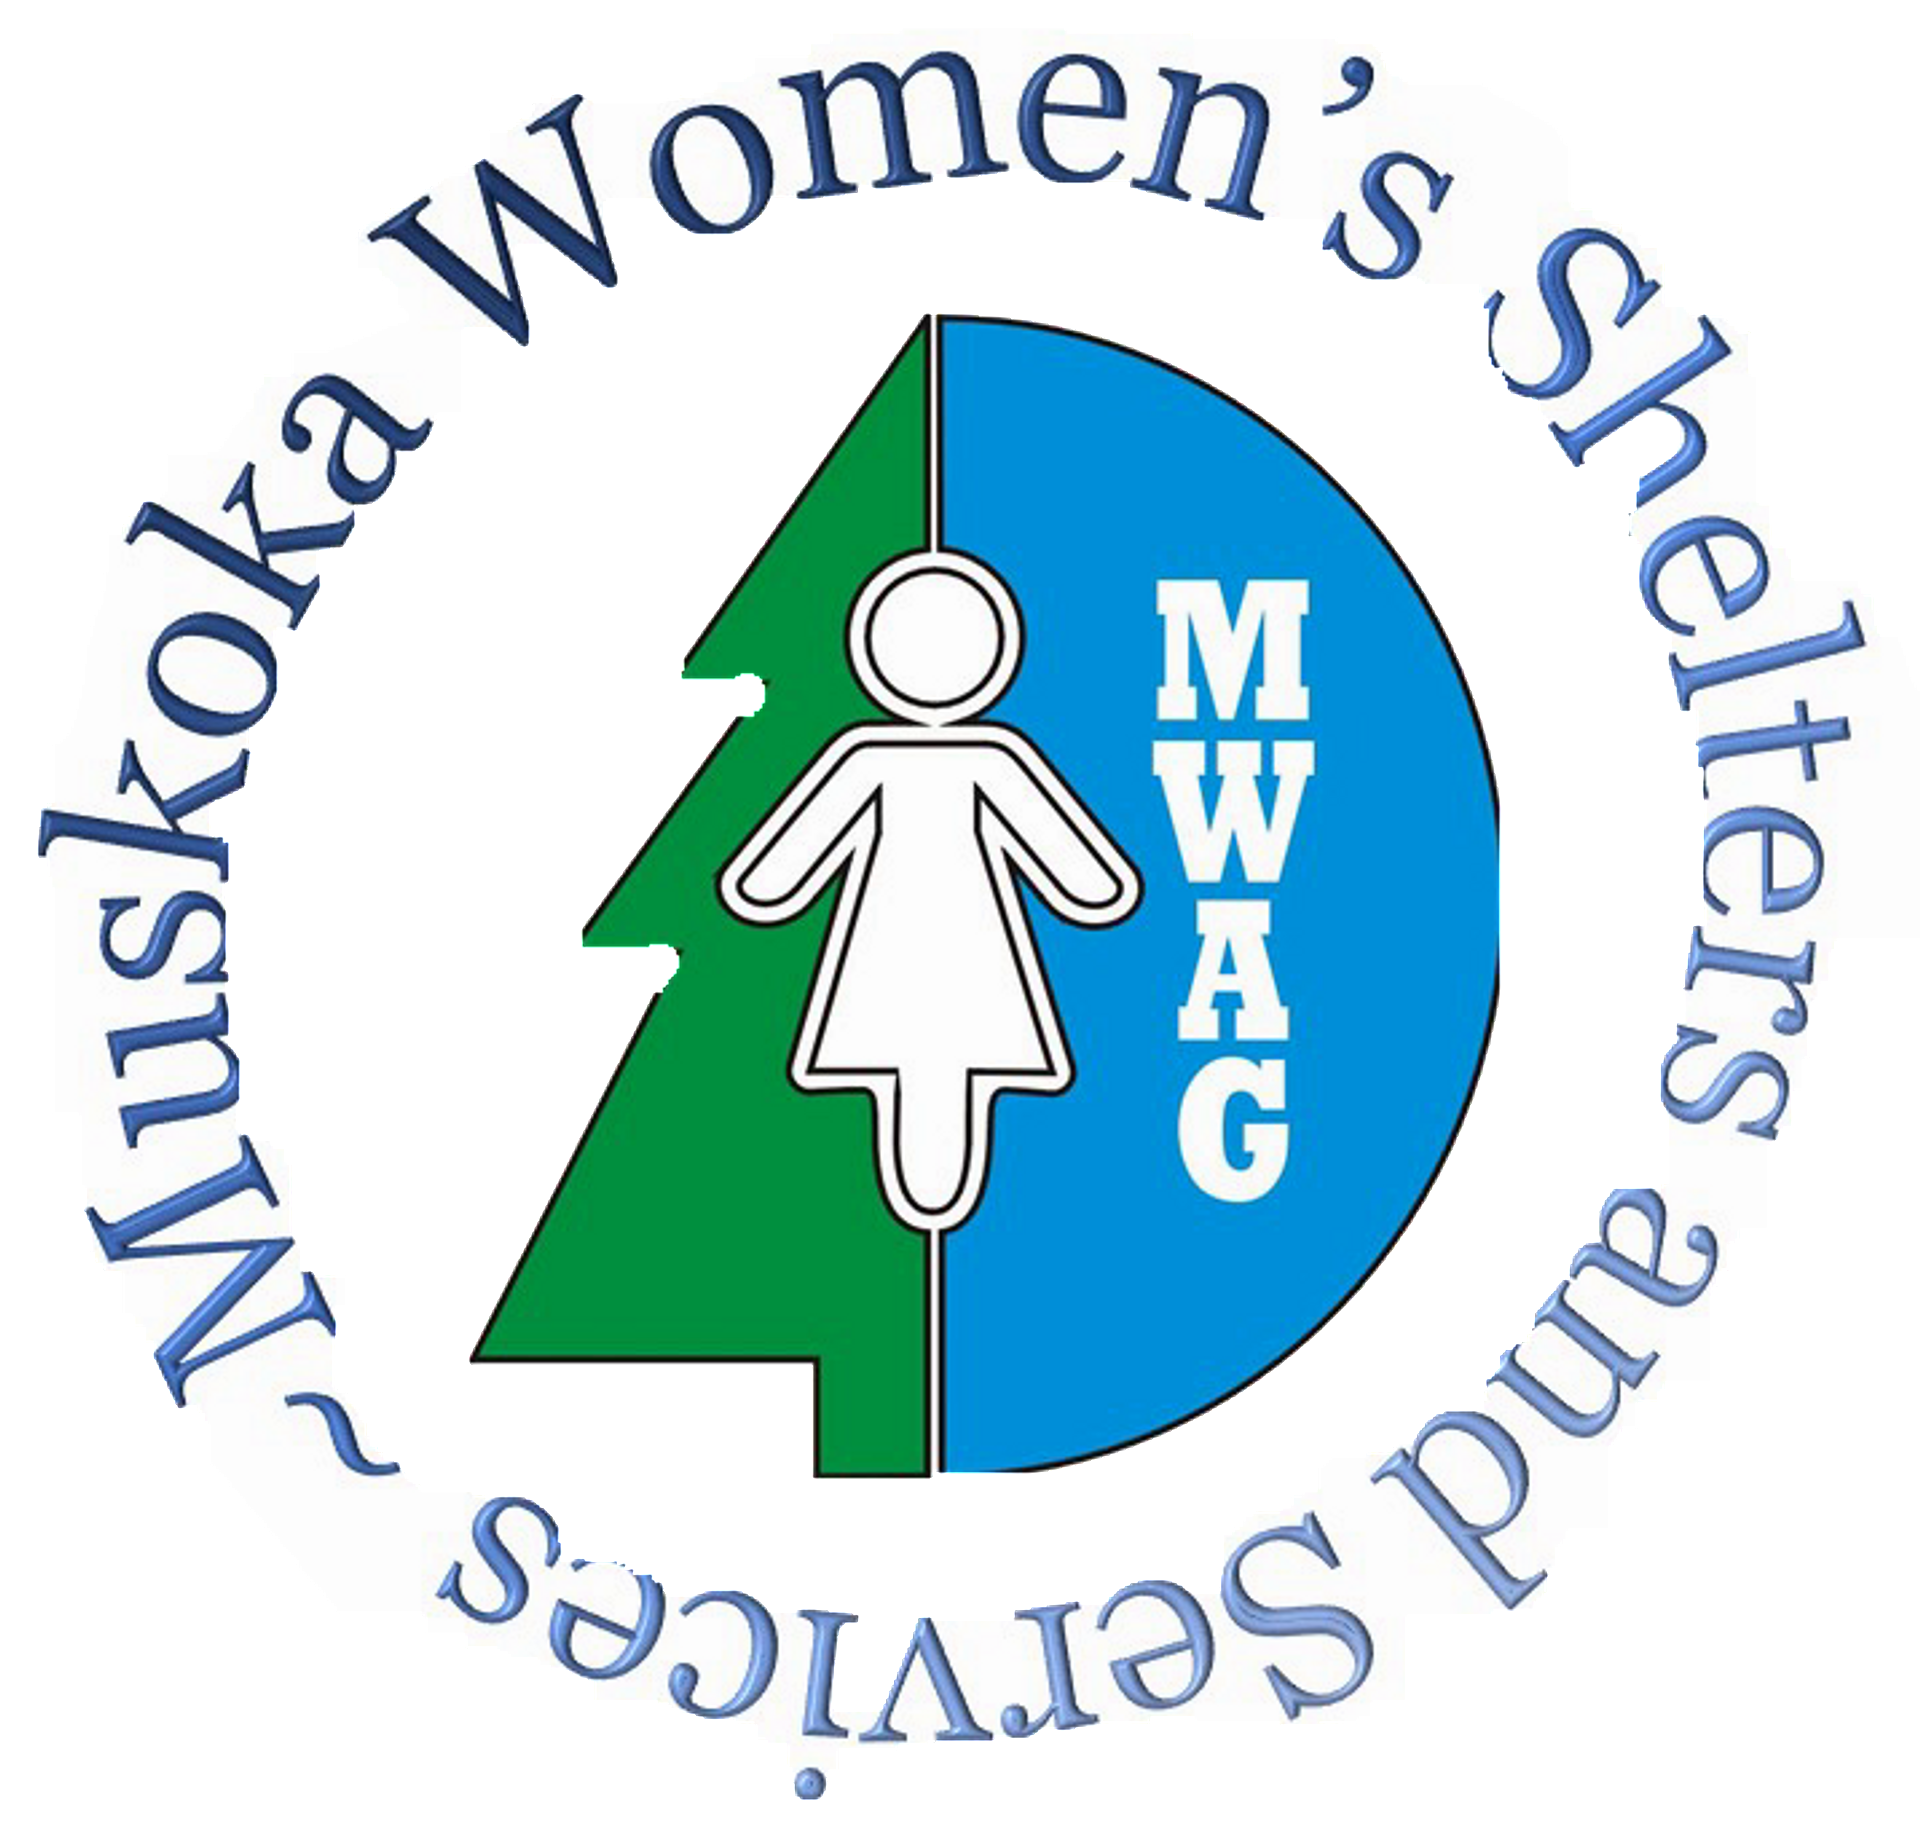 Muskoka Women's Advocacy Group